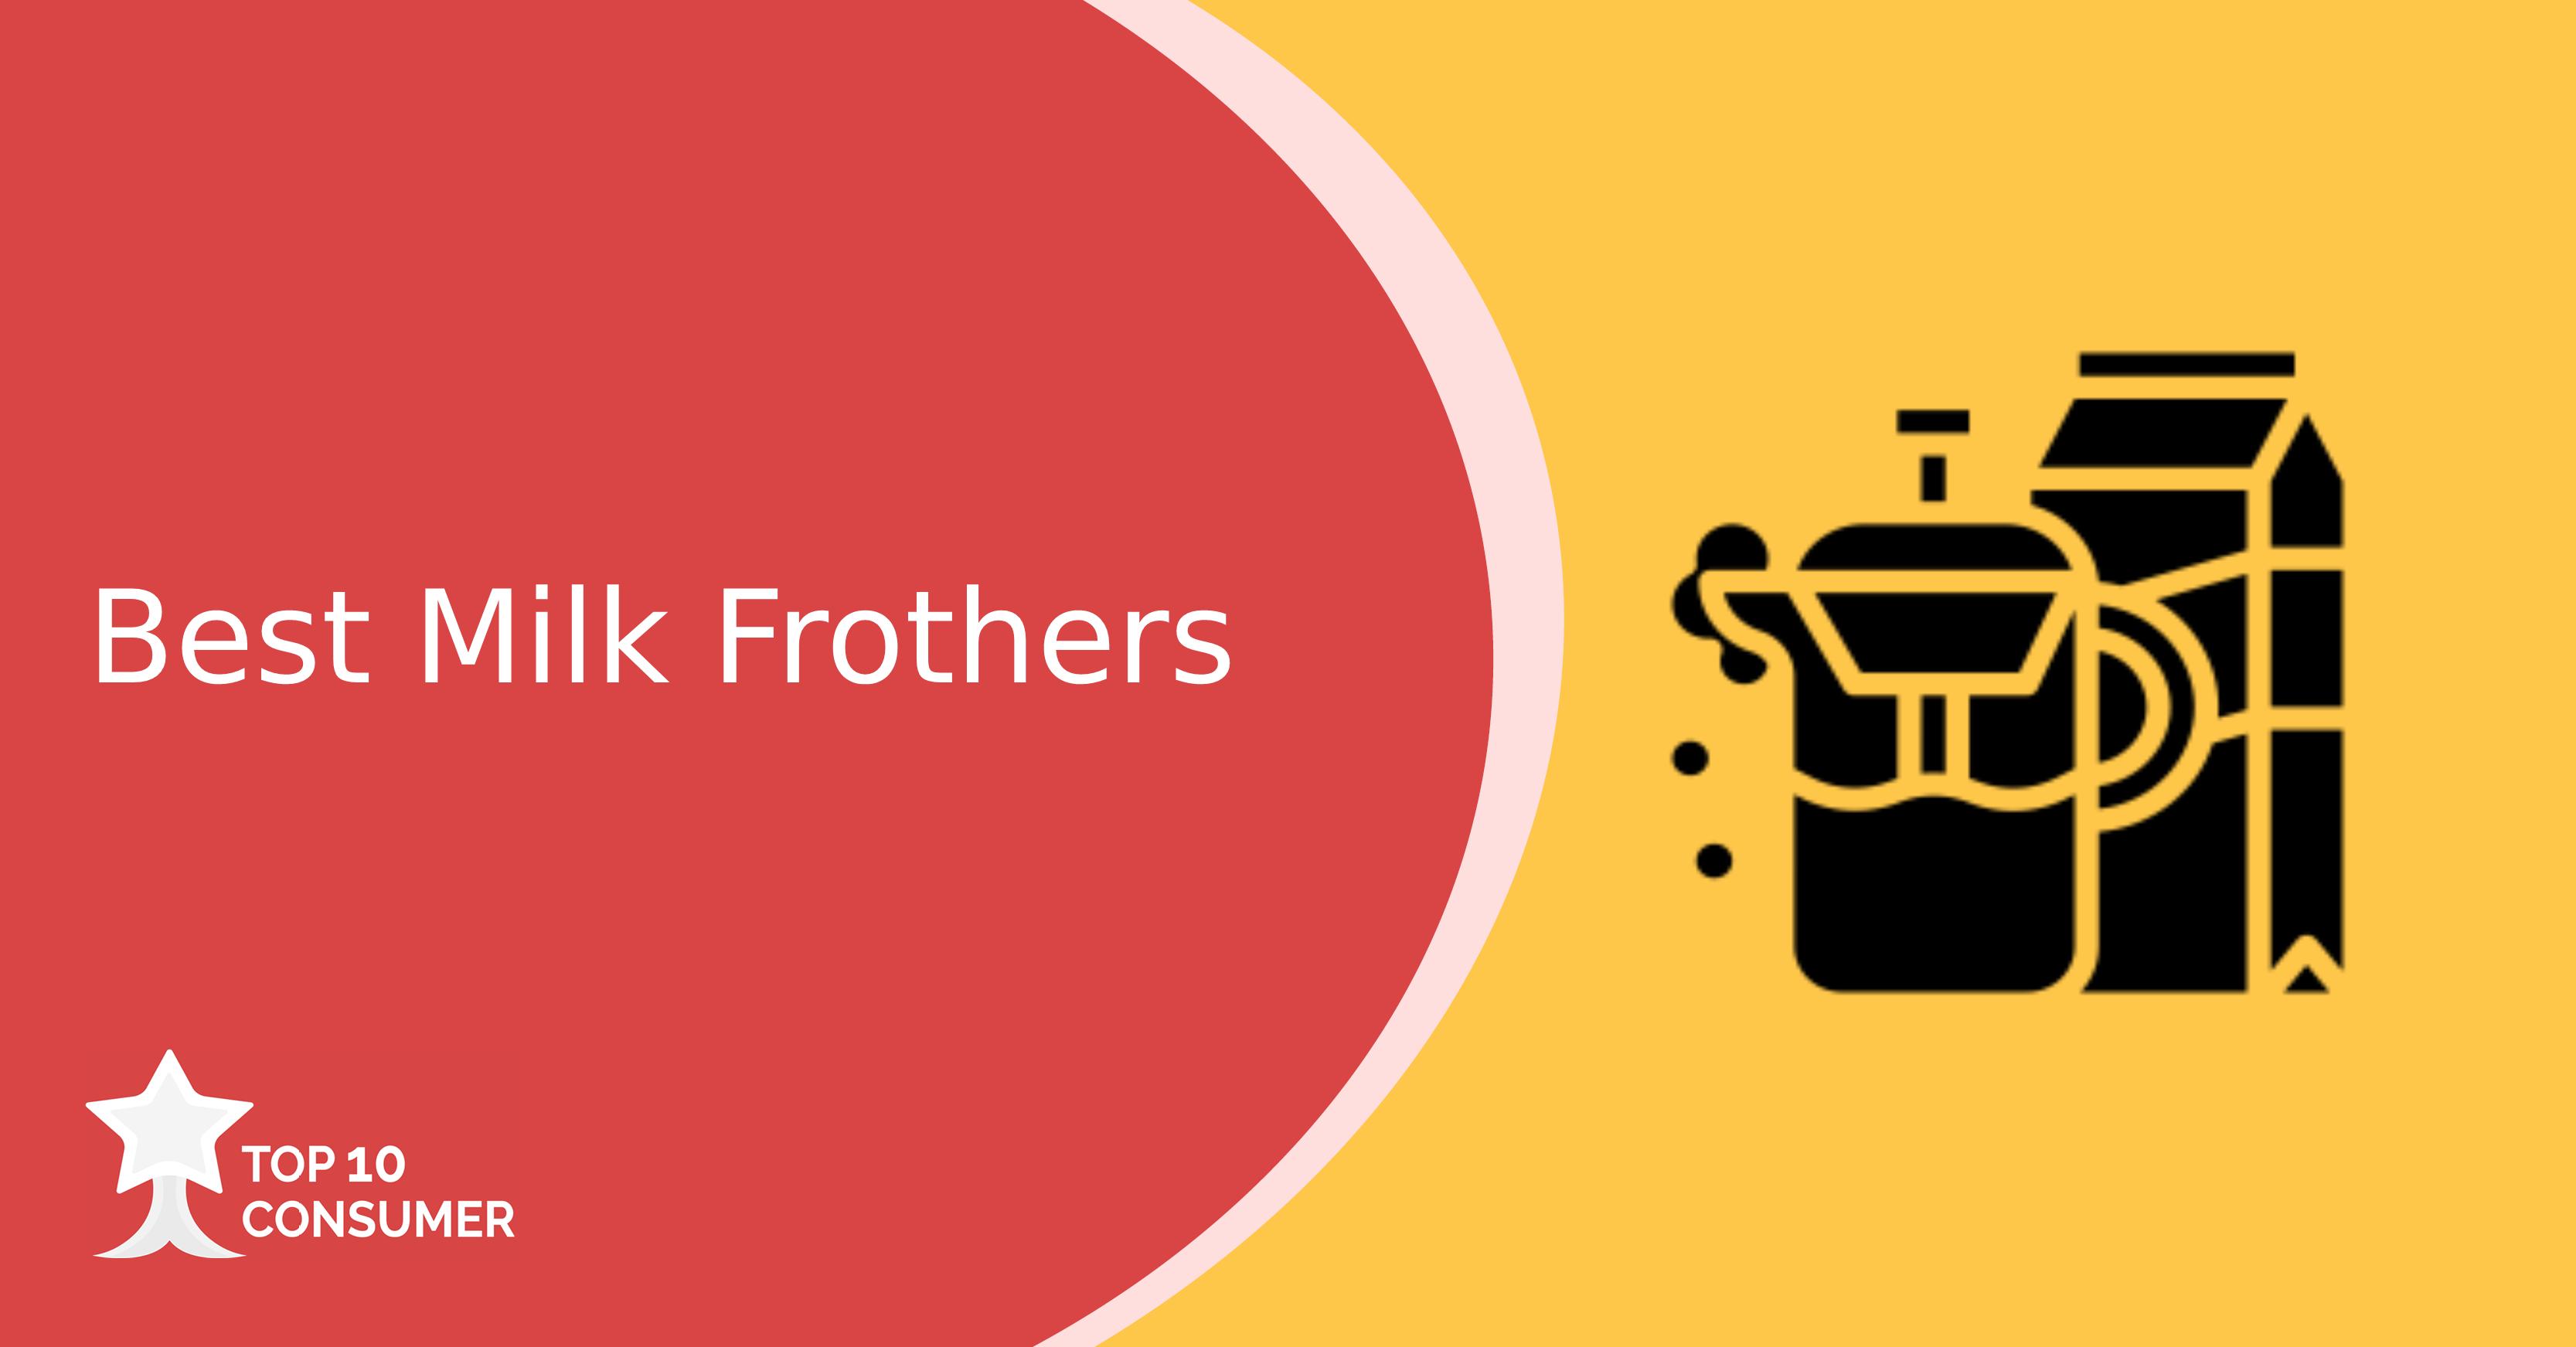 Best Milk Frothers